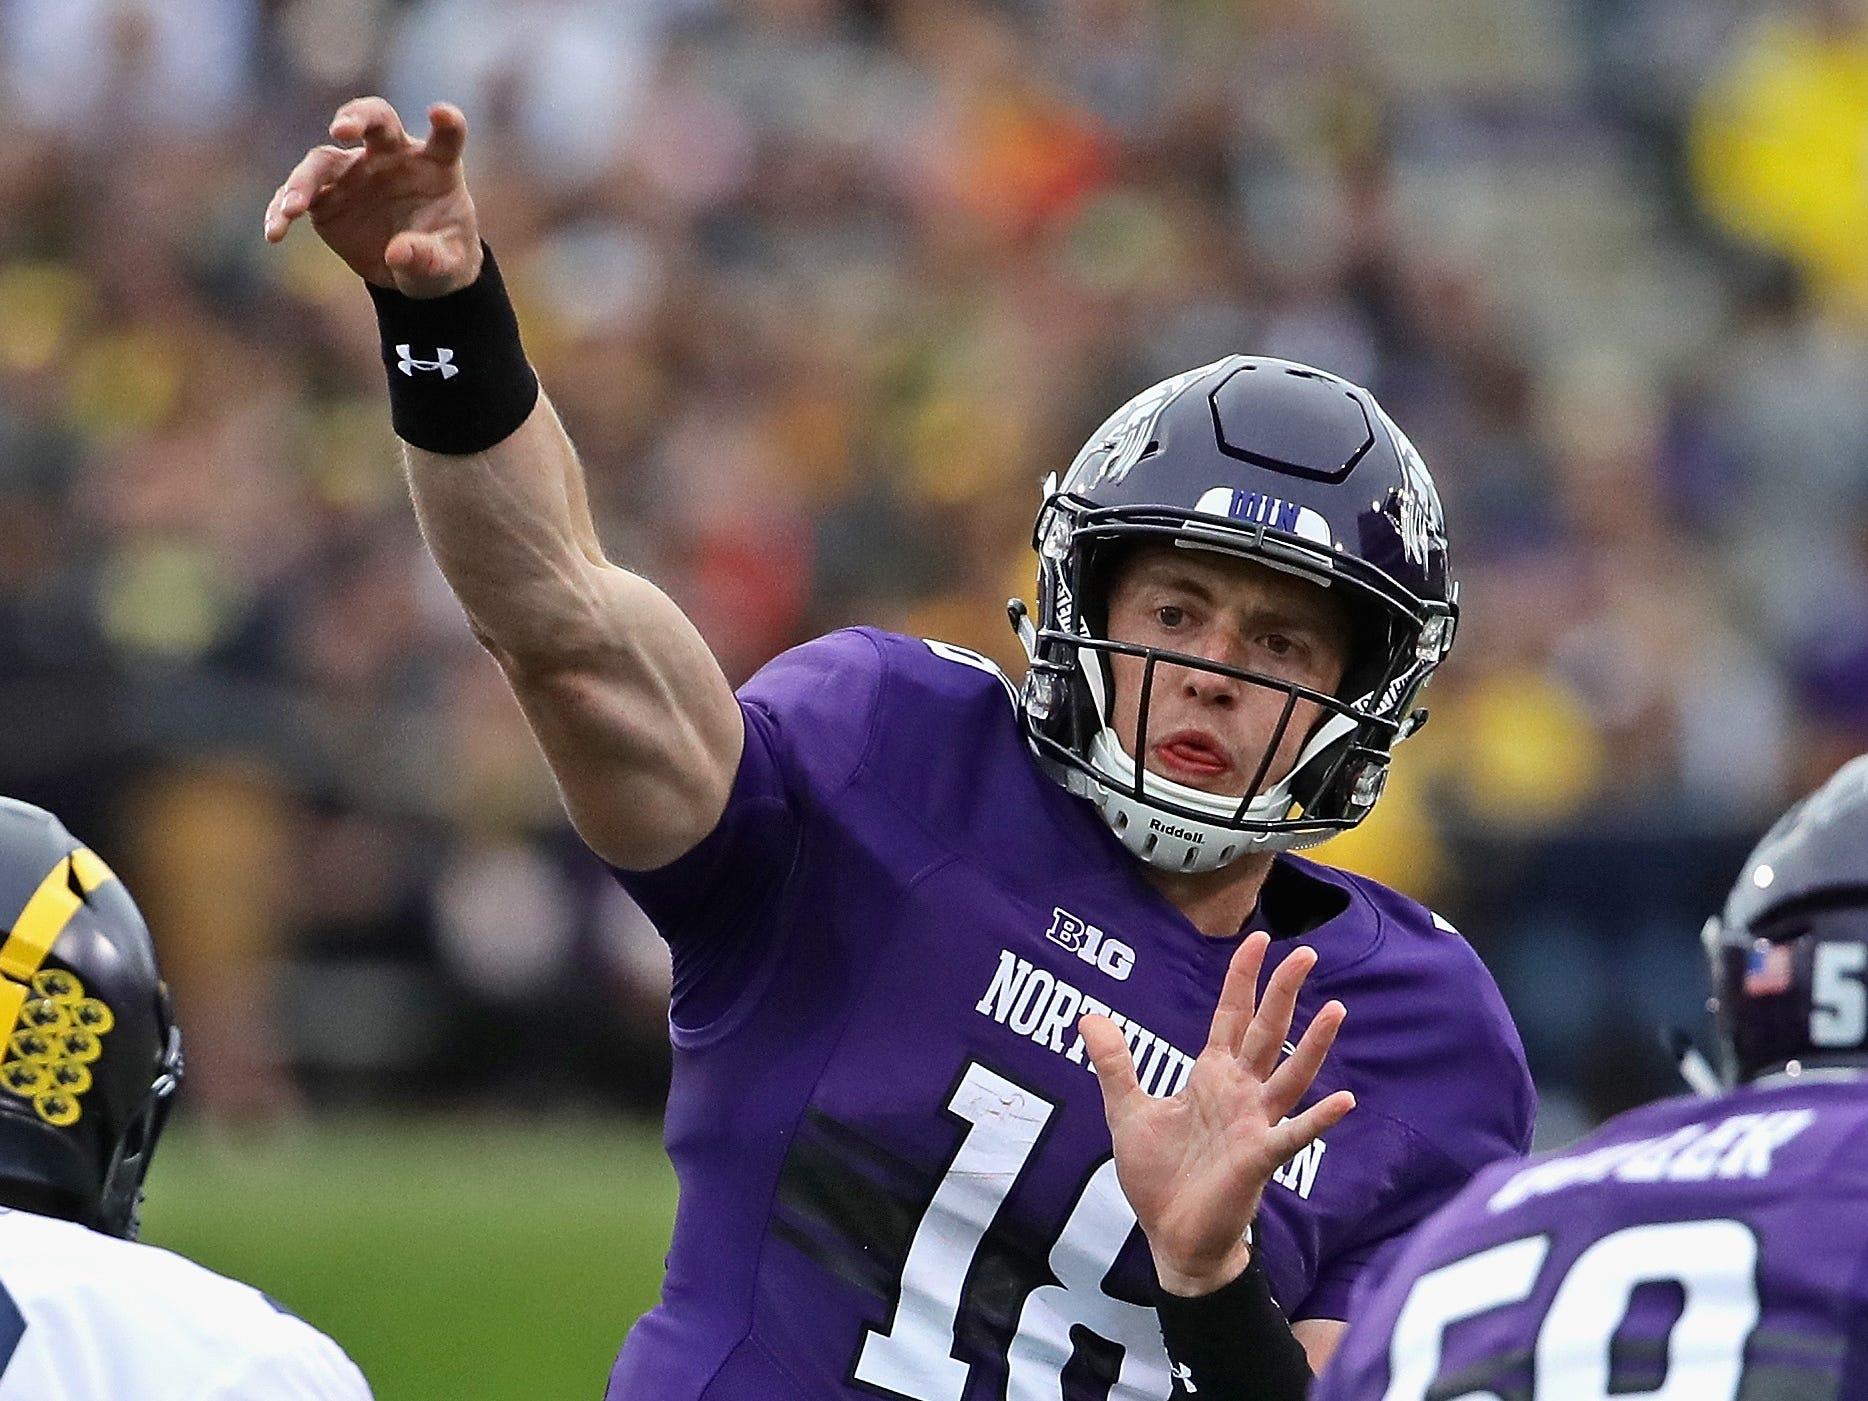 Northwestern's Clayton Thorson passes against Michigan at Ryan Field on Sept. 29, 2018 in Evanston, Ill.